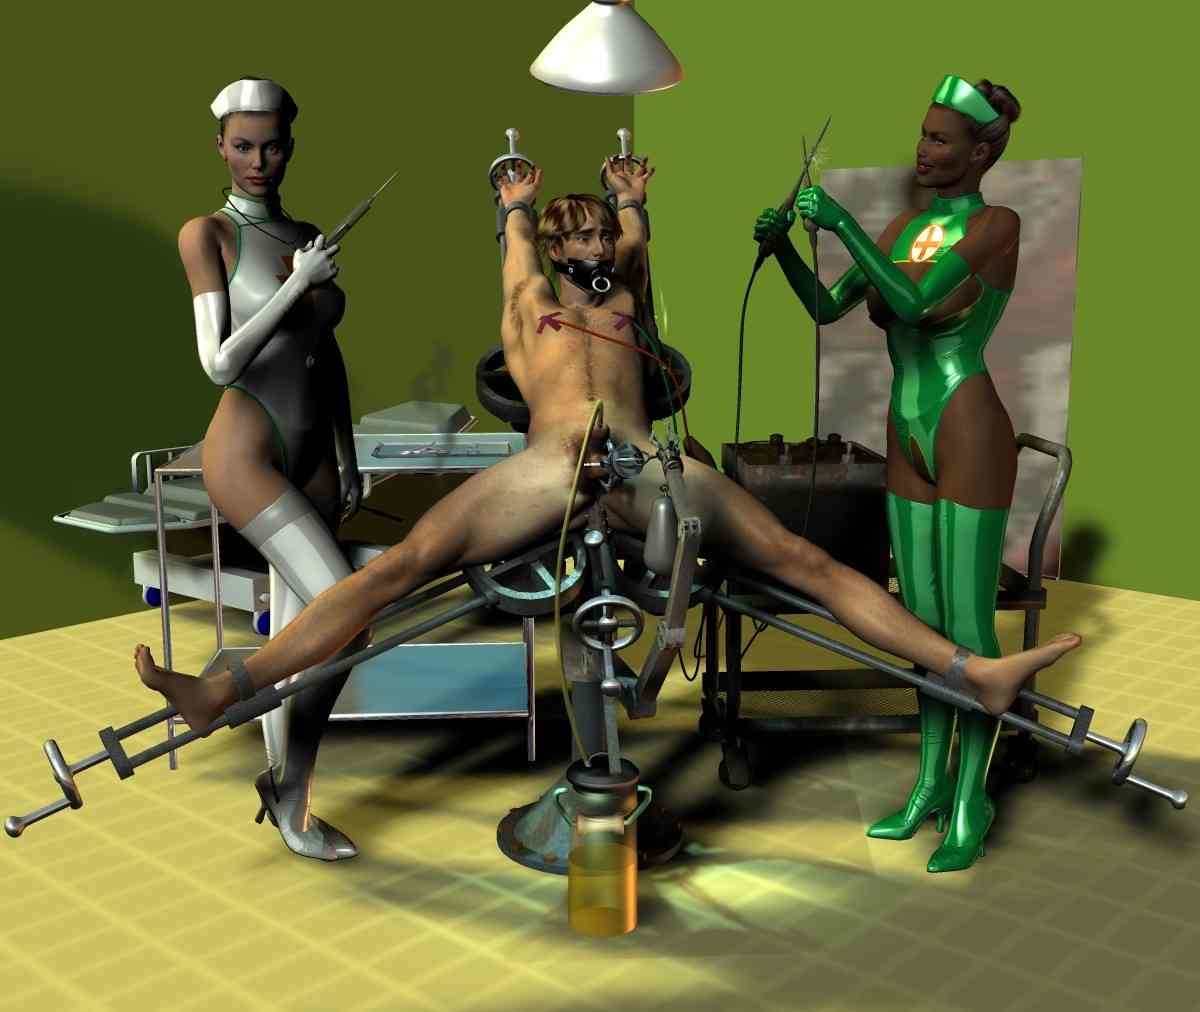 Black male spanking male video gay hoyt 10